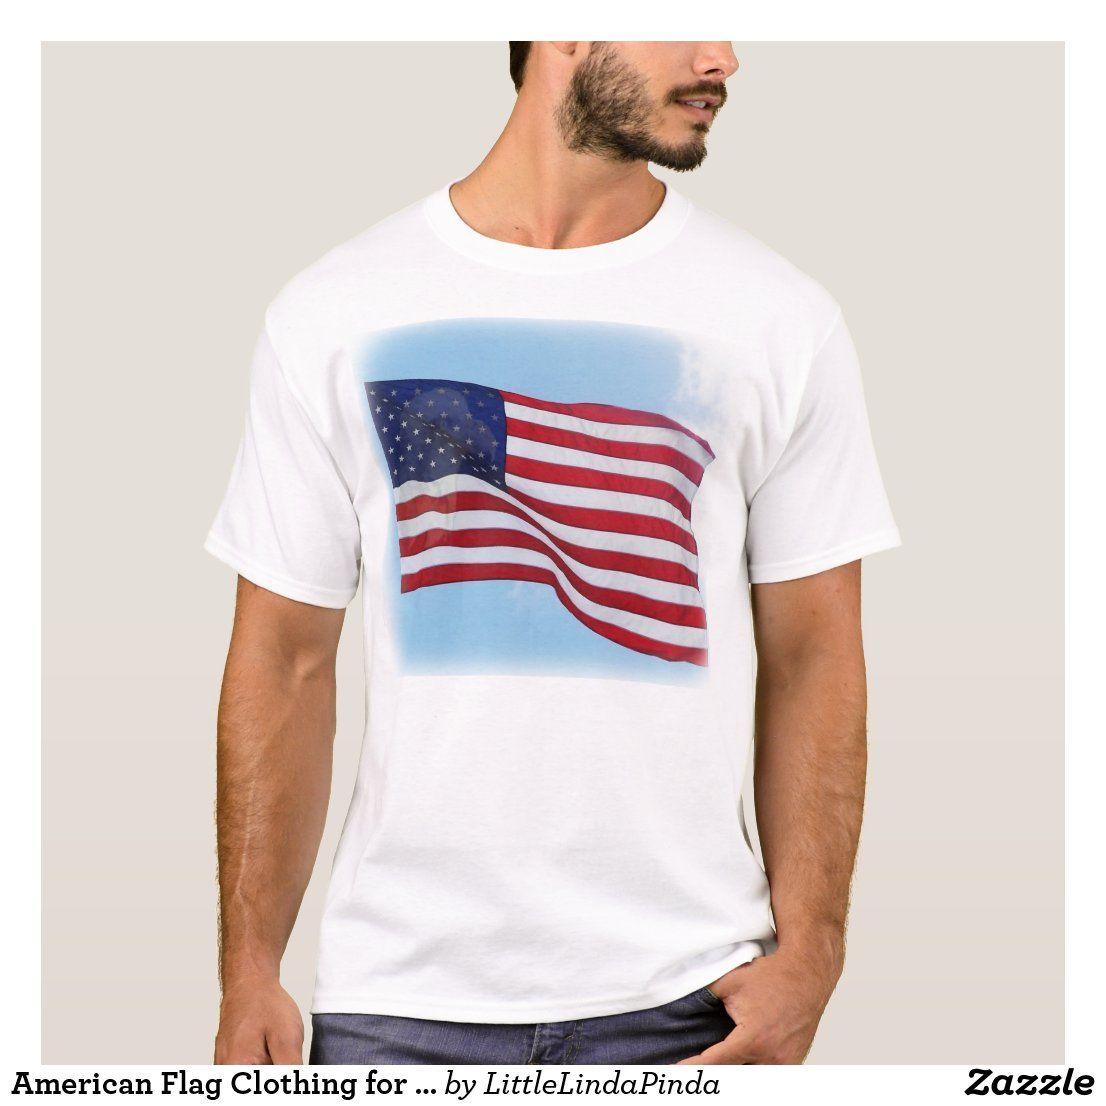 American flag clothing for men tshirt in